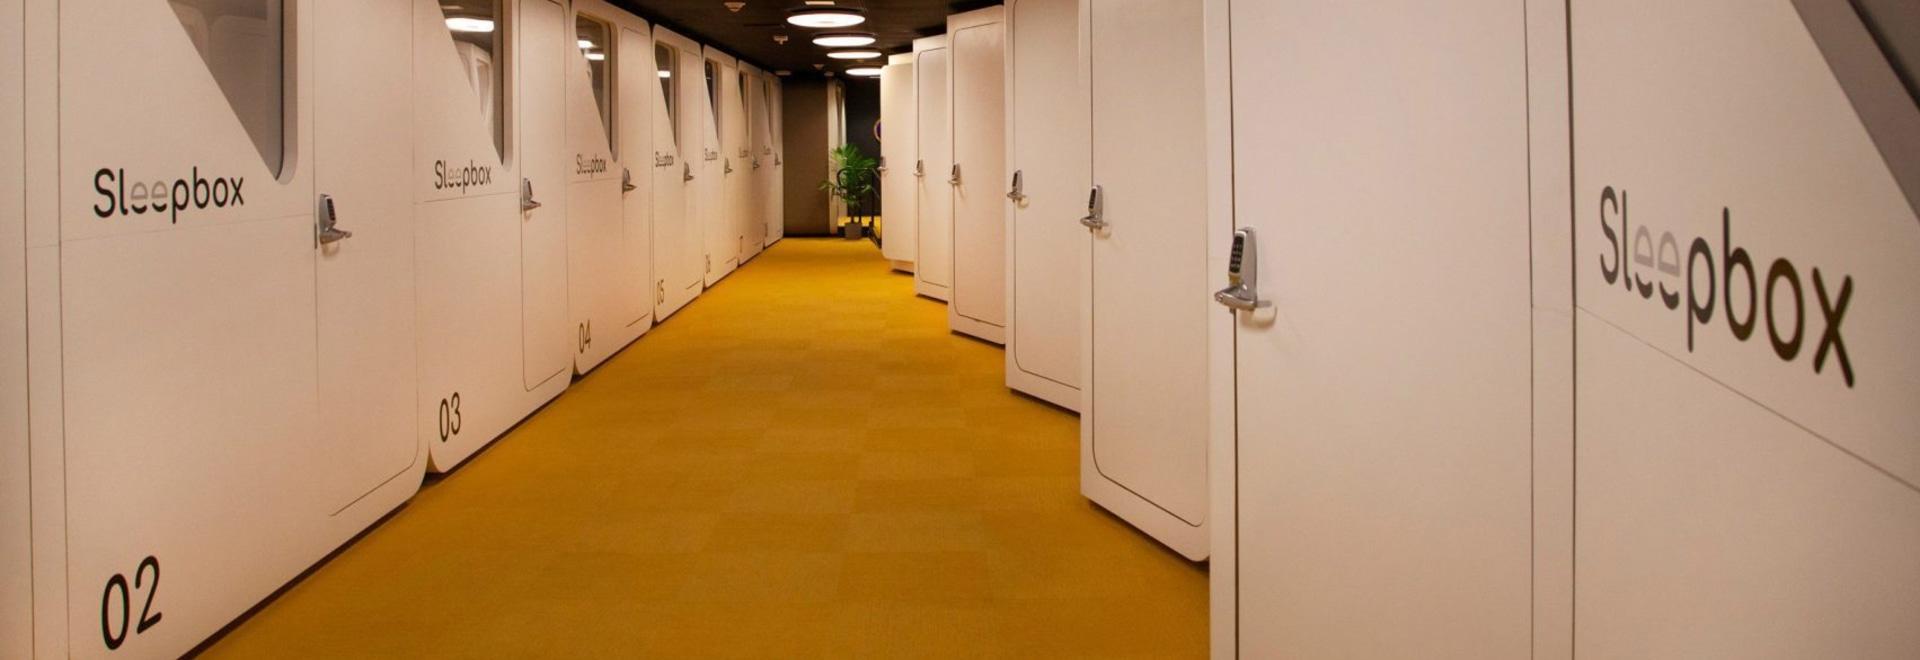 Sleepbox pods installed at Dulles International Airport